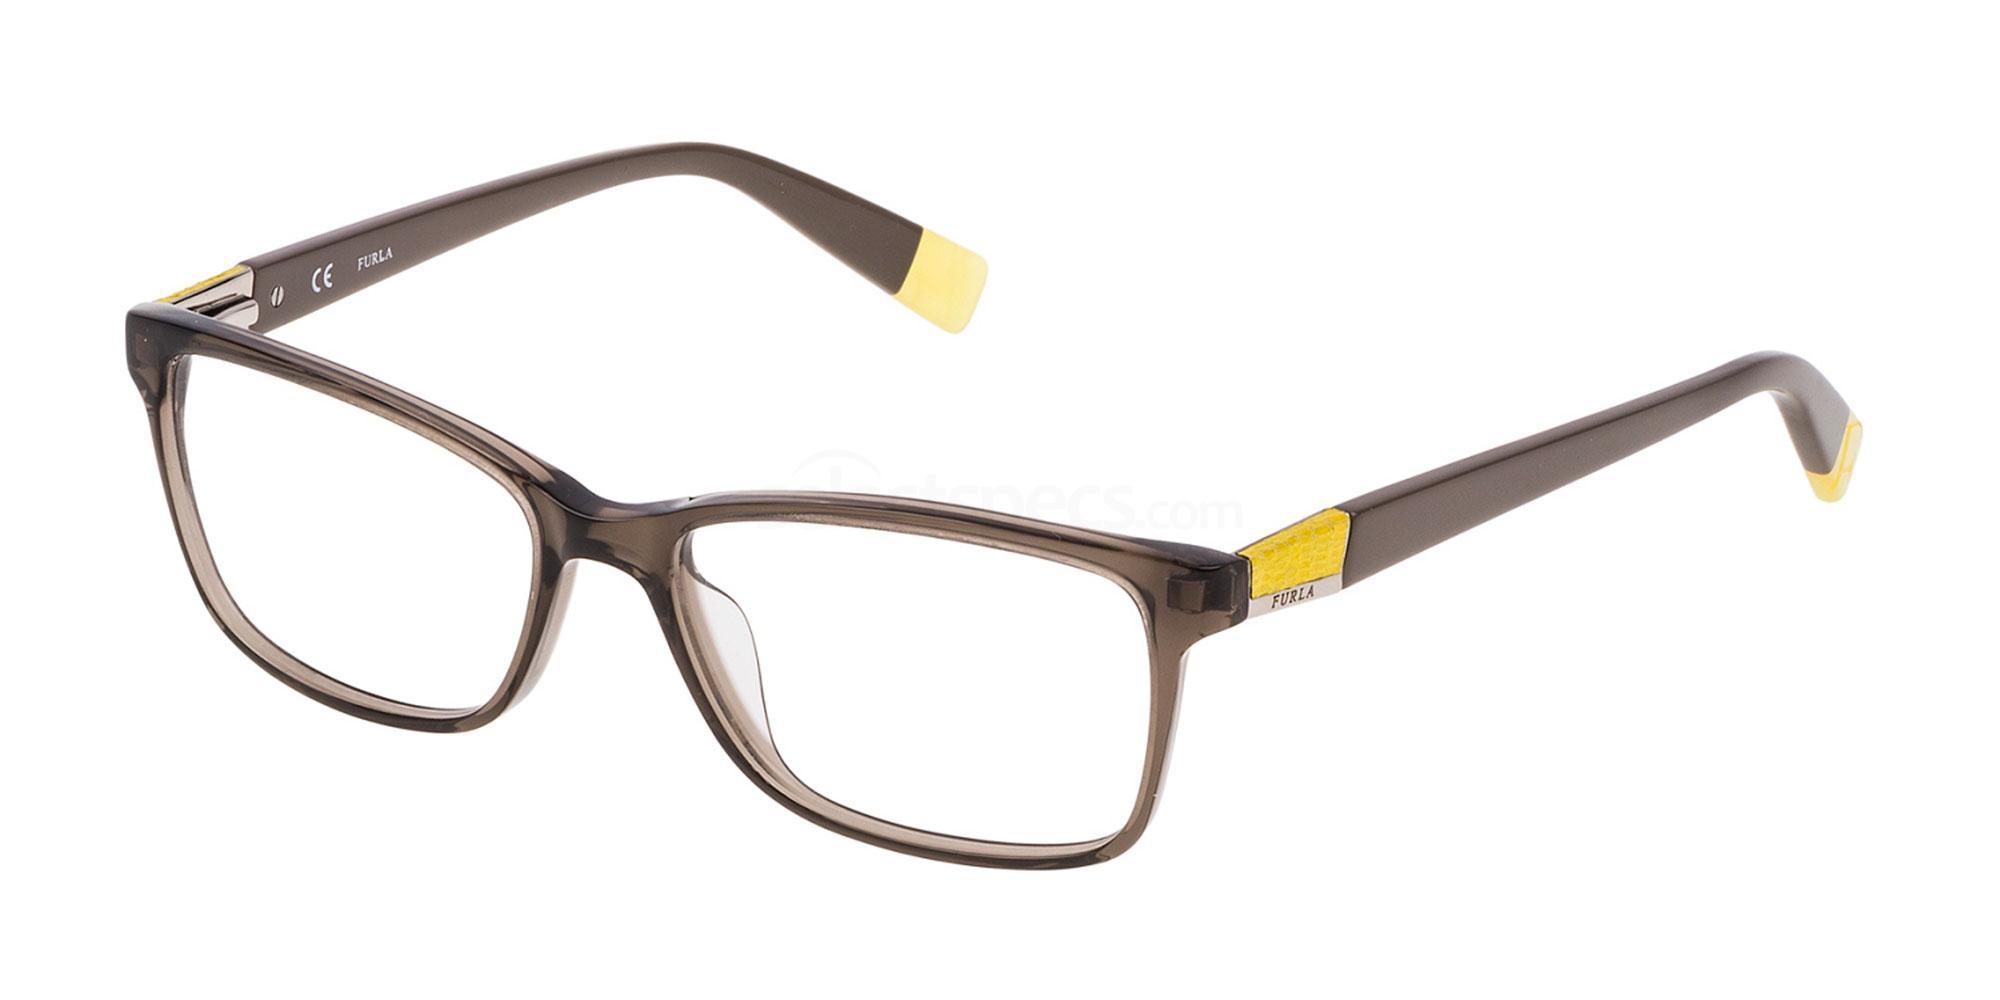 09DL VFU005 Glasses, Furla